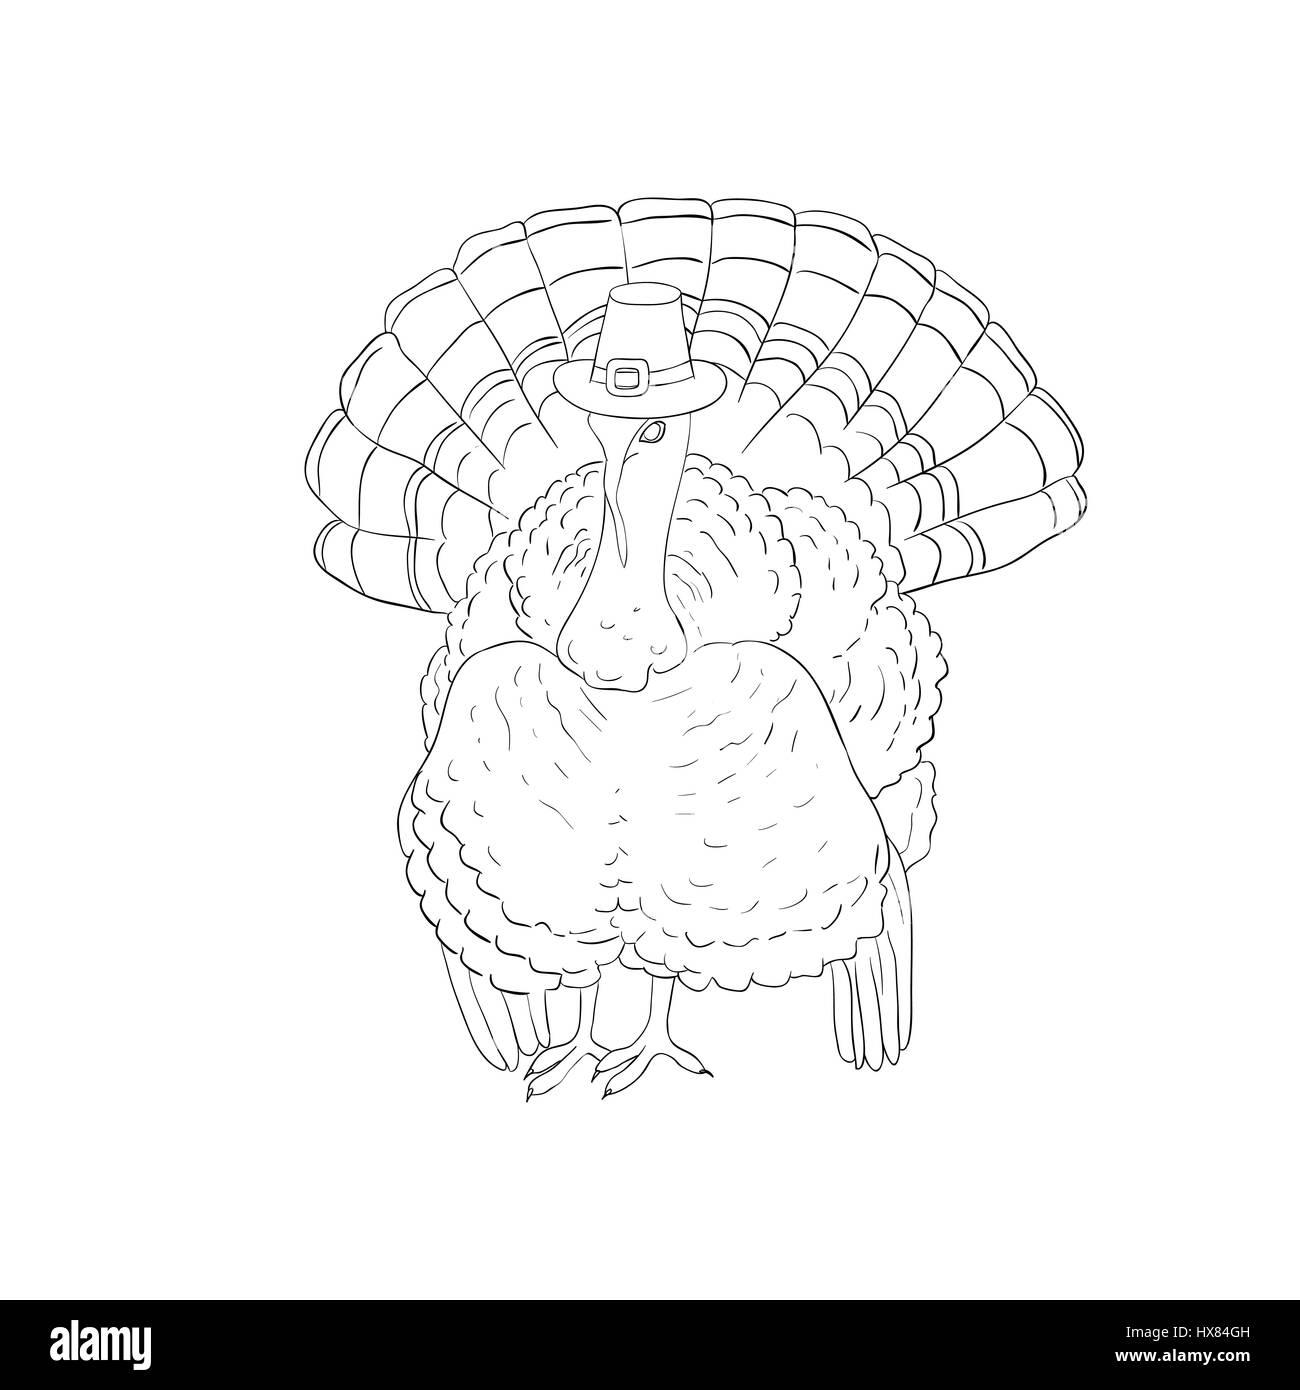 Großzügig Thanksgiving Türkei Färbung Bilder Ideen - Entry Level ...